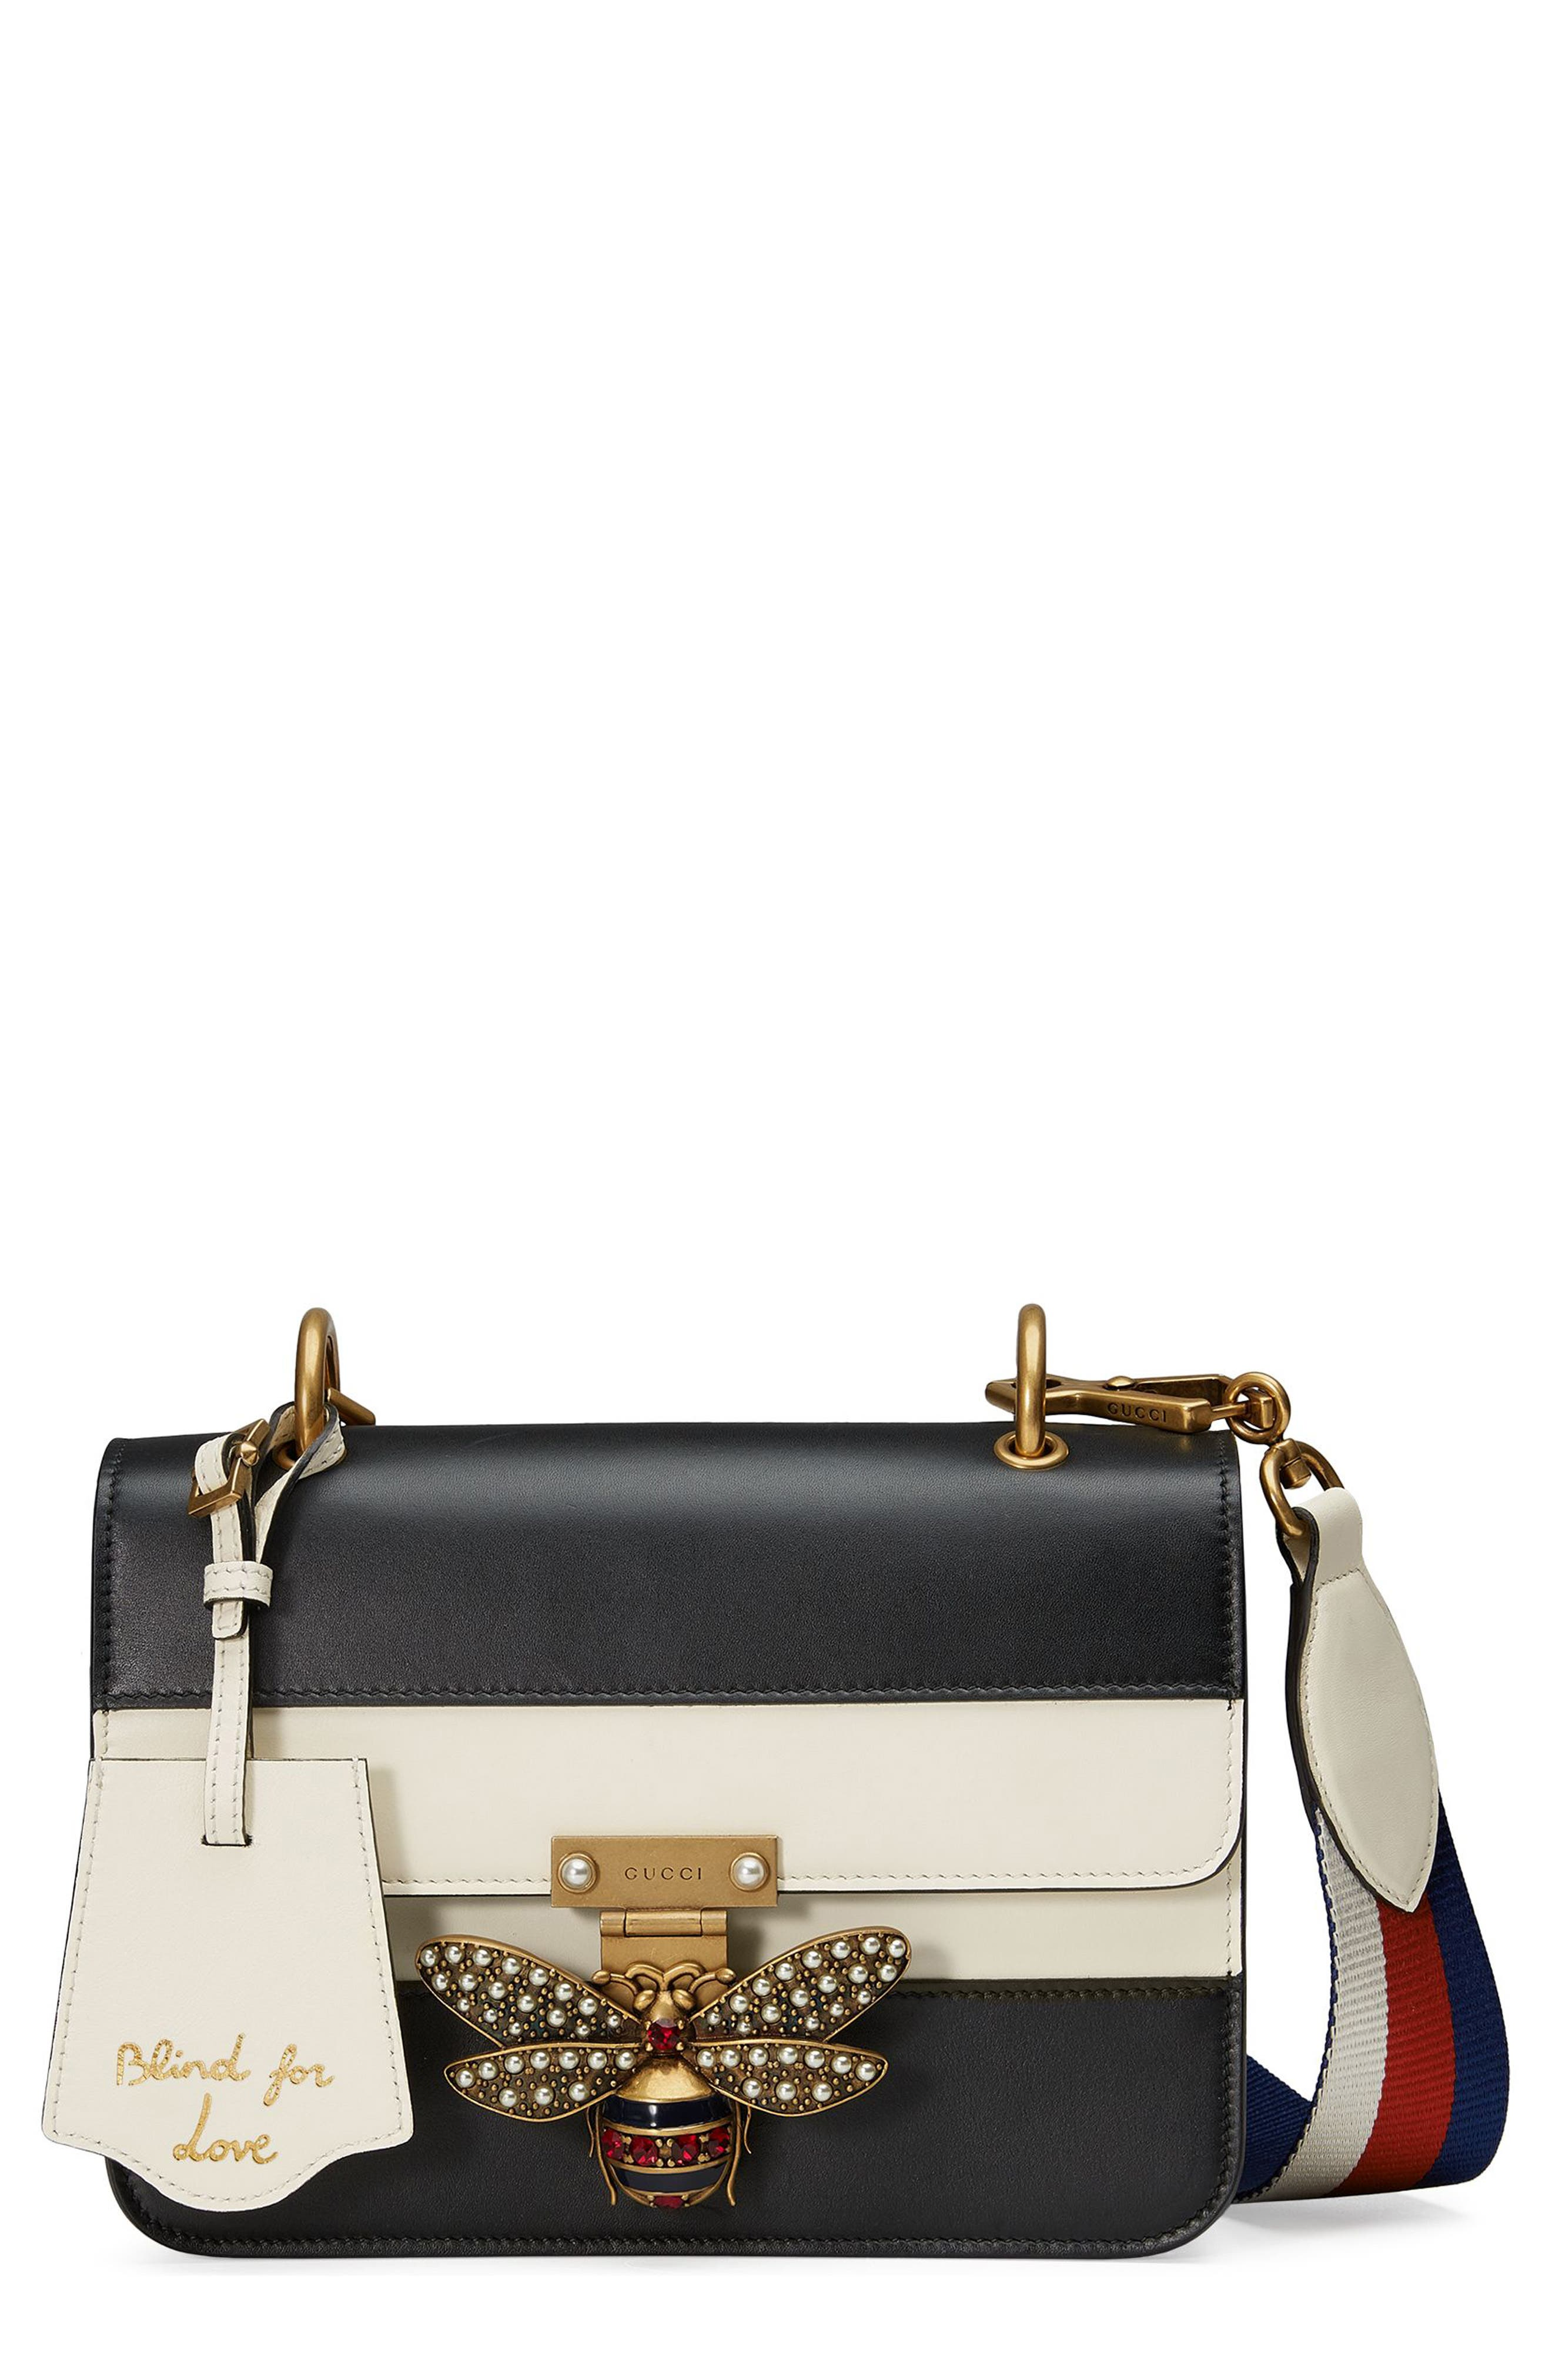 Queen Margaret Stripe Leather Shoulder Bag,                             Main thumbnail 1, color,                             Black/White